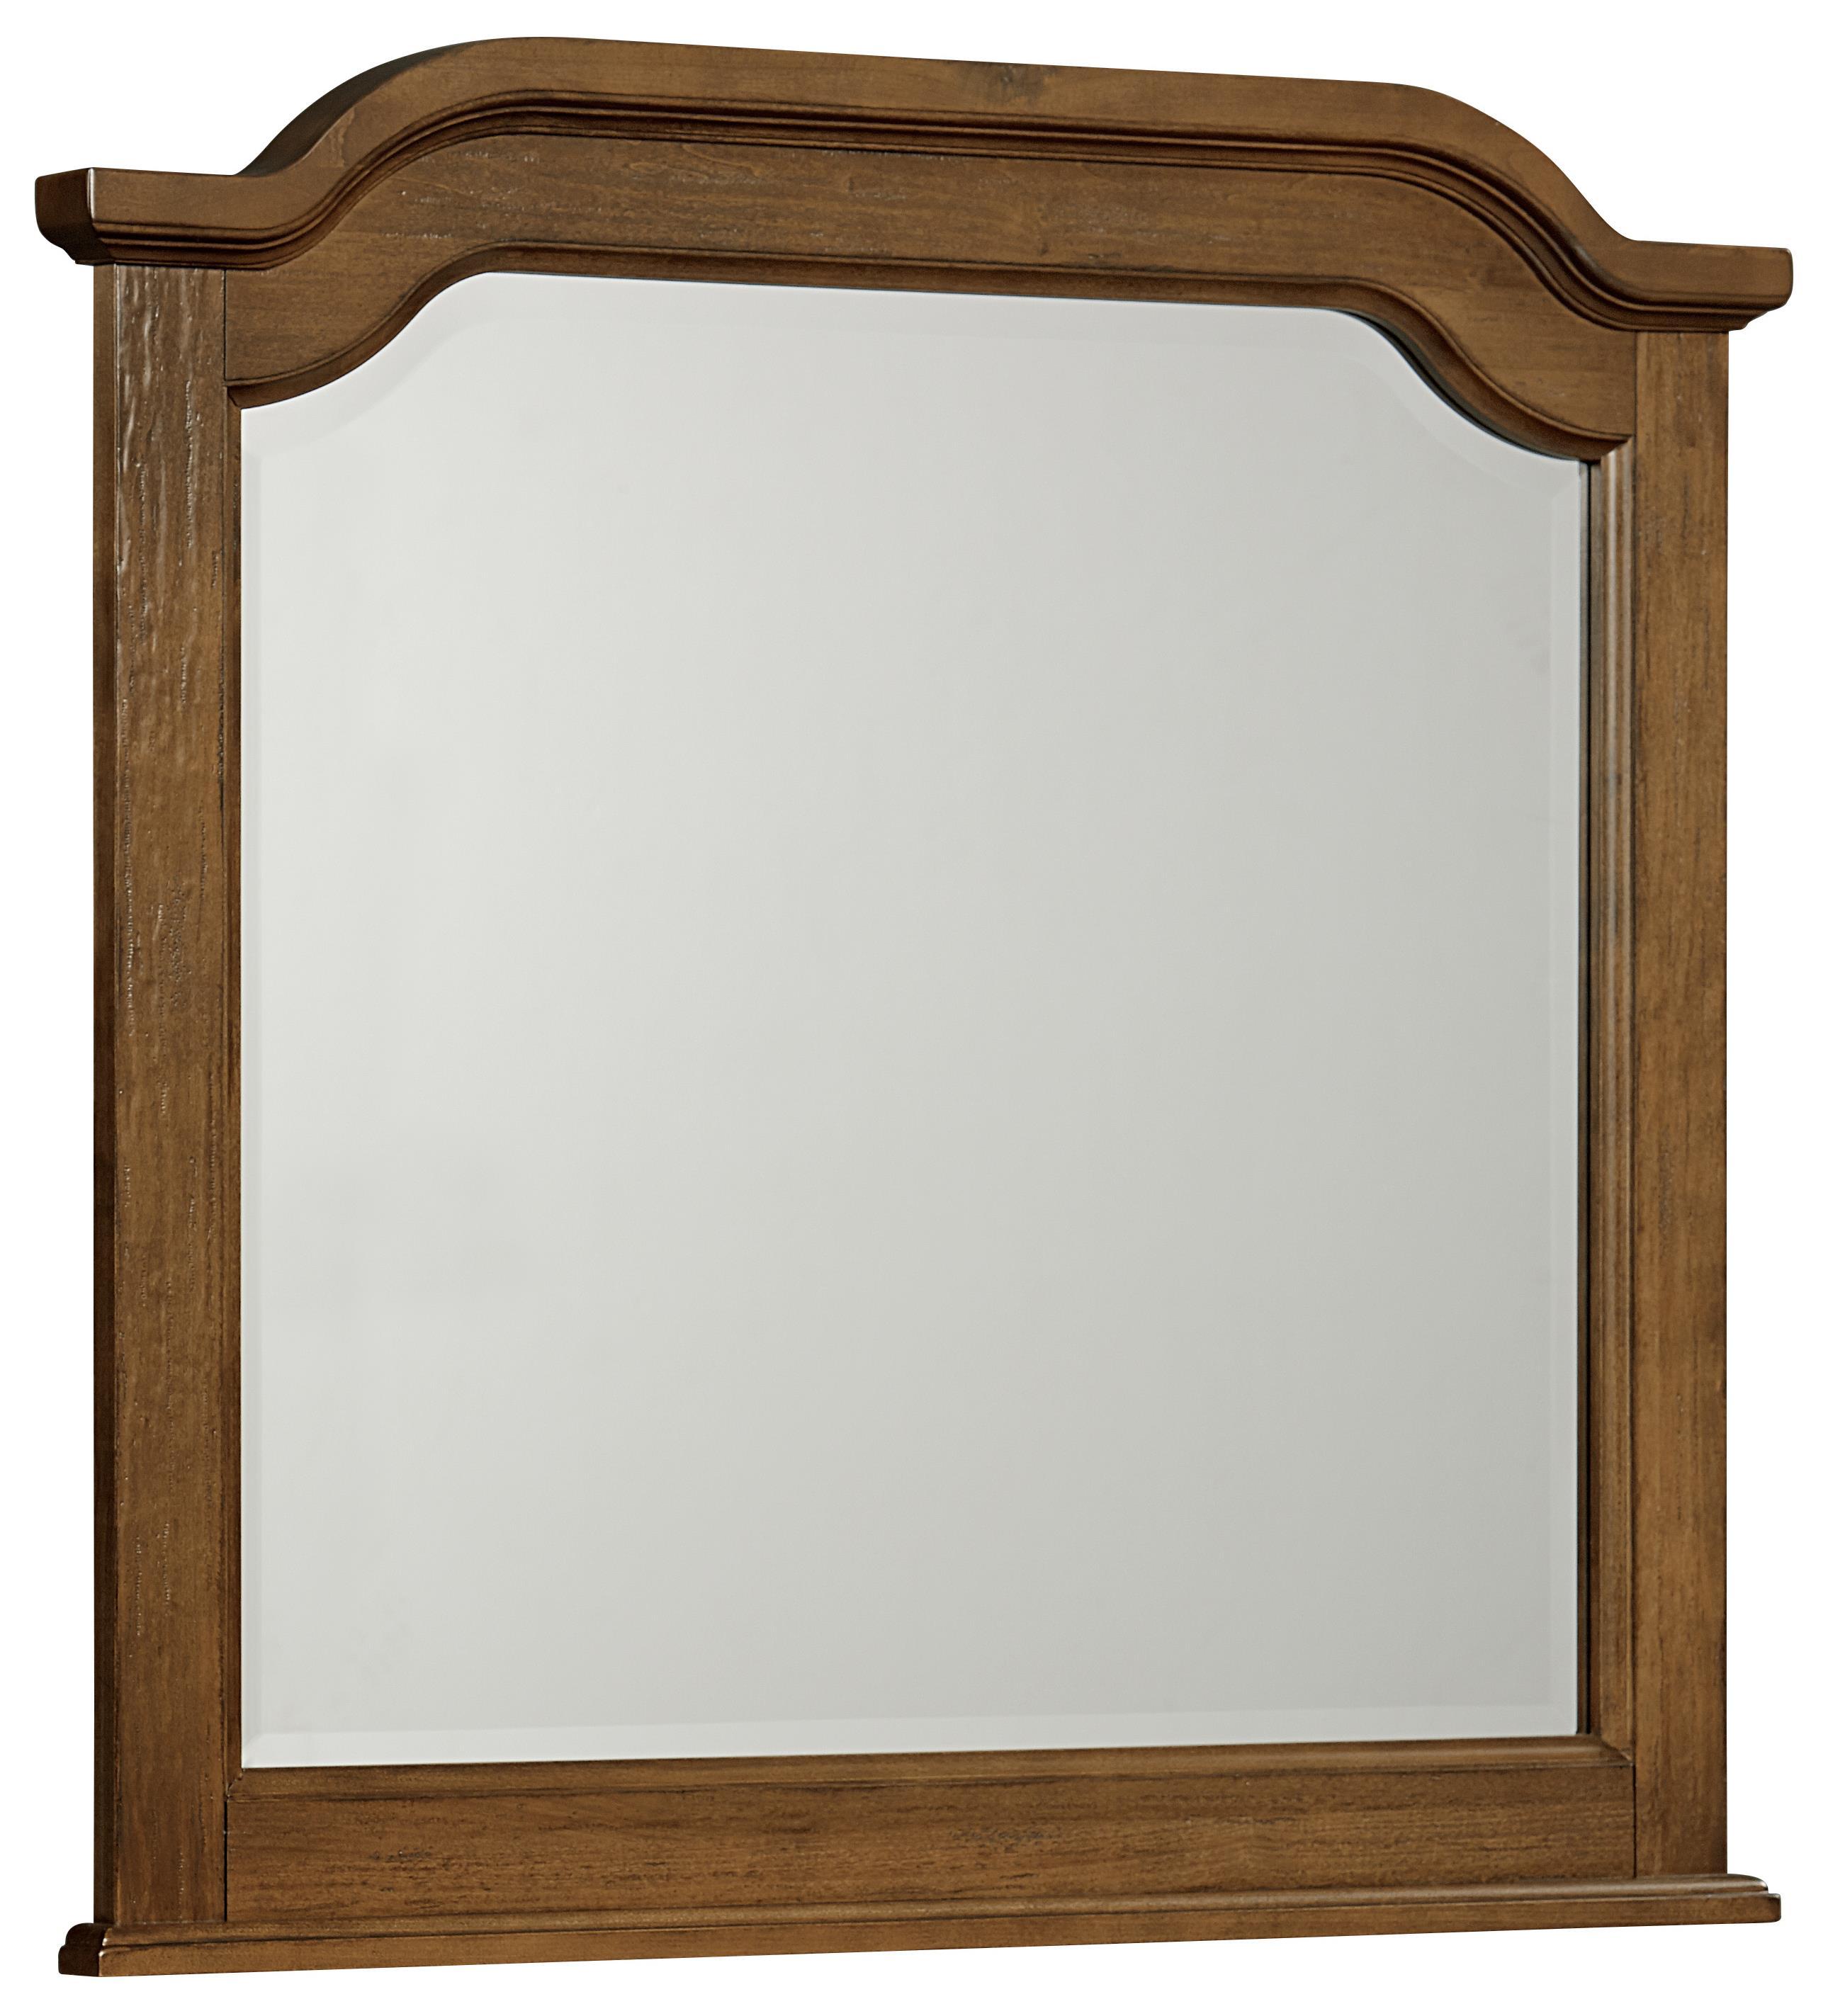 Vaughan Bassett Arrendelle Arch Mirror - Item Number: 440-446